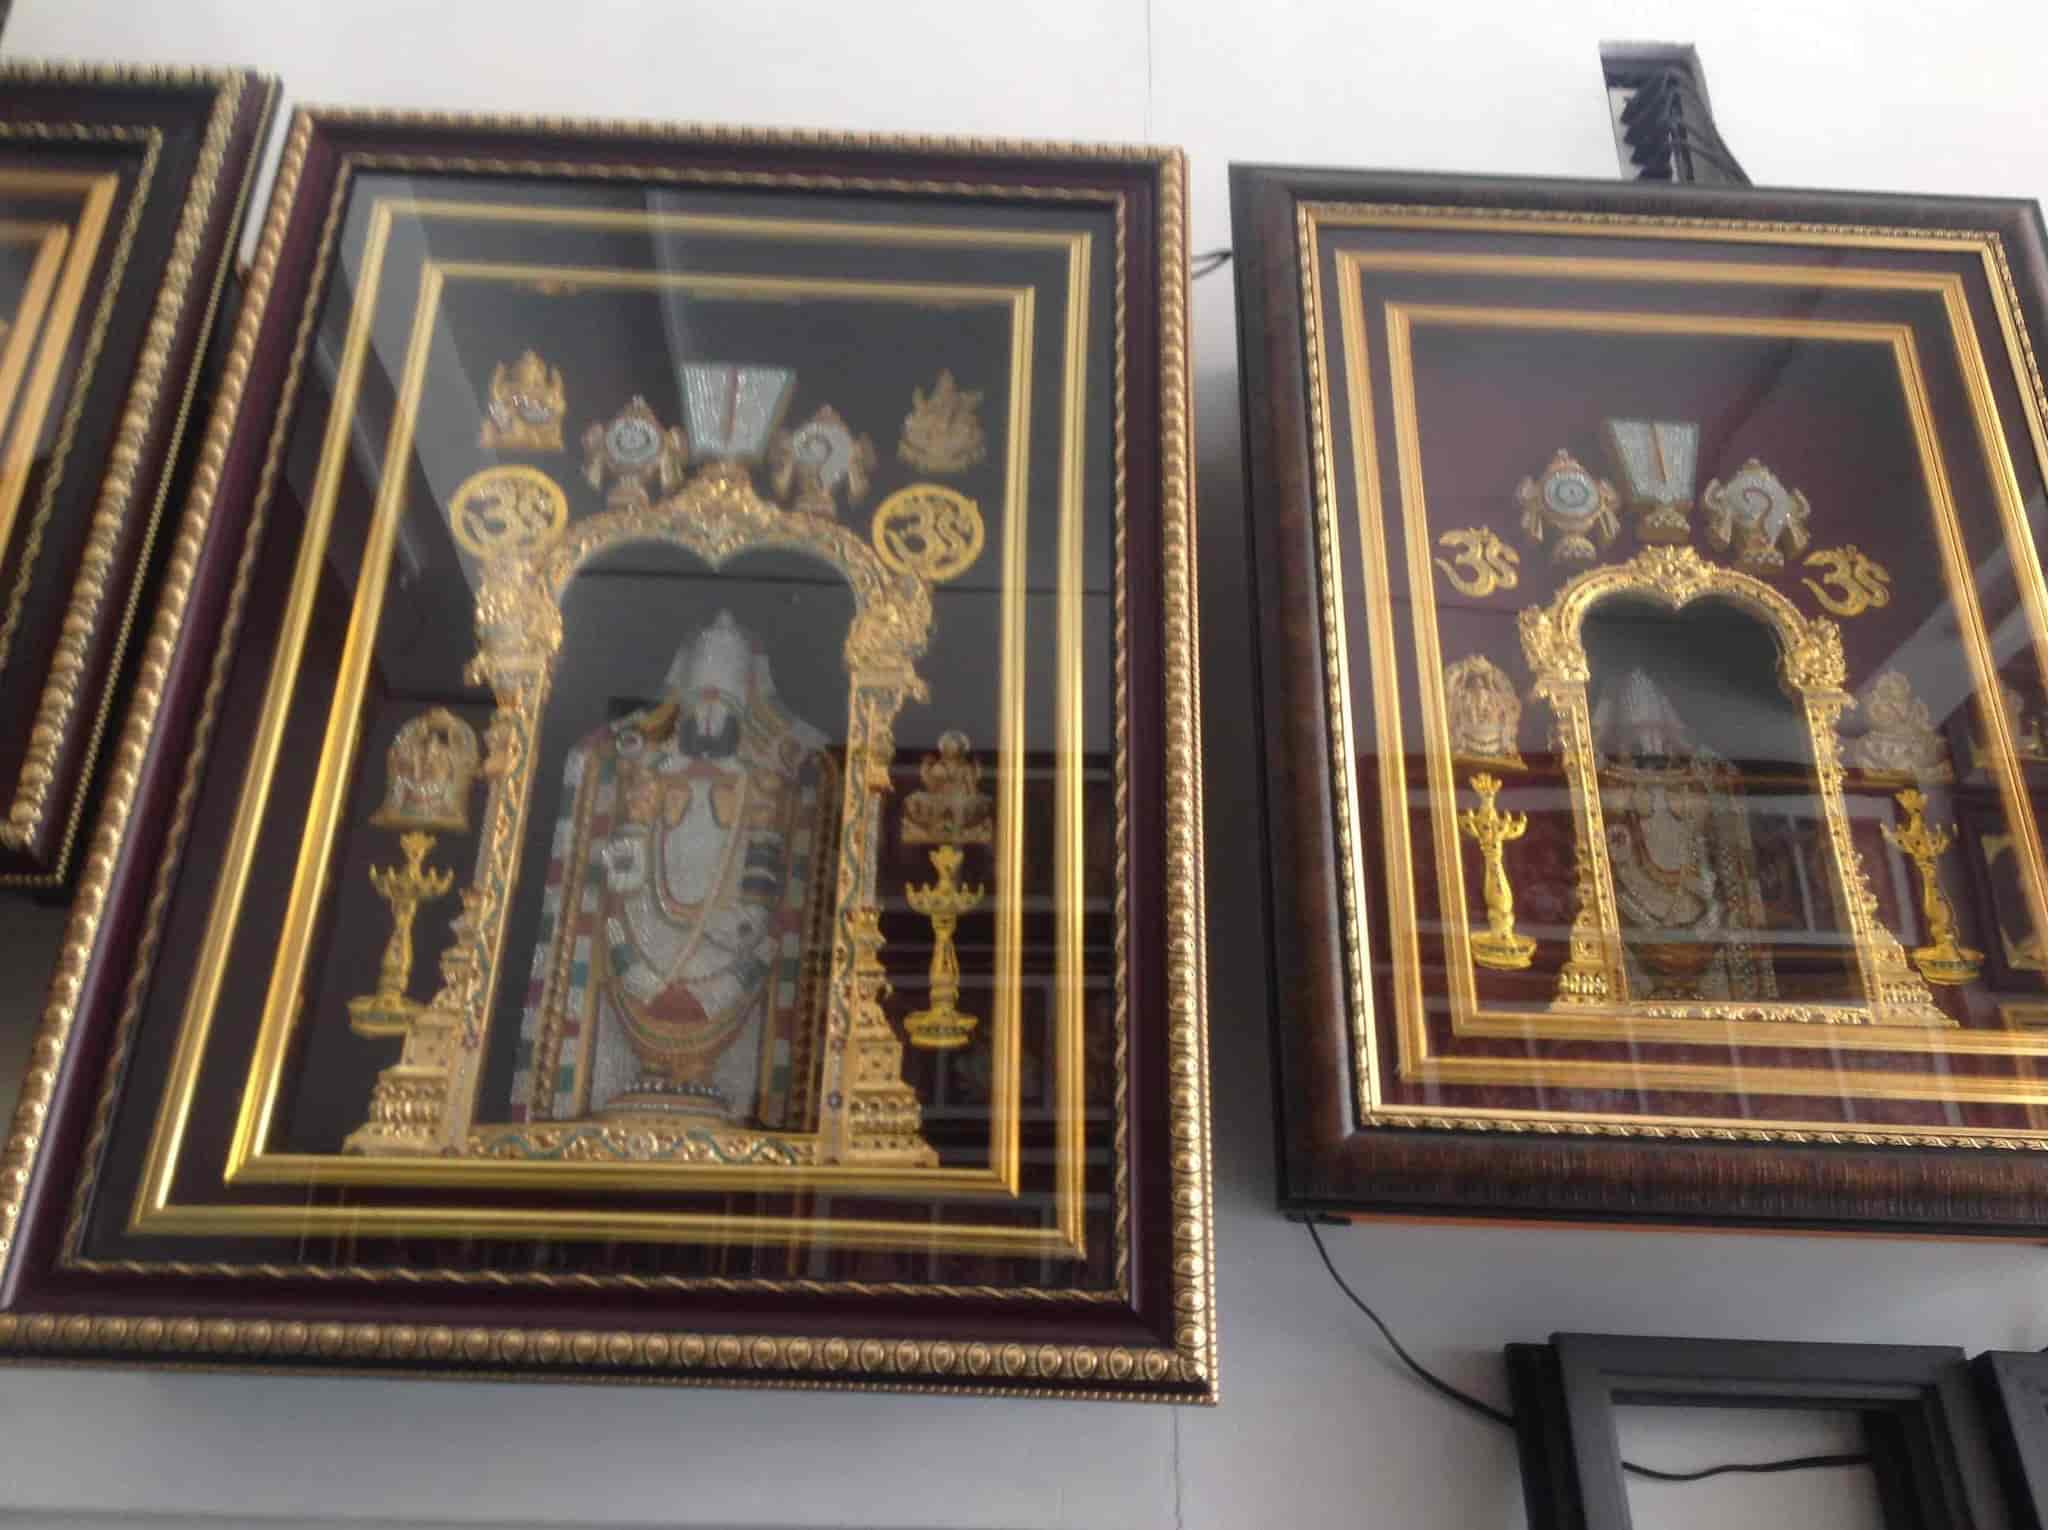 Venkateshwara Frame Works Photos, Bazaar, Tirupur- Pictures & Images ...